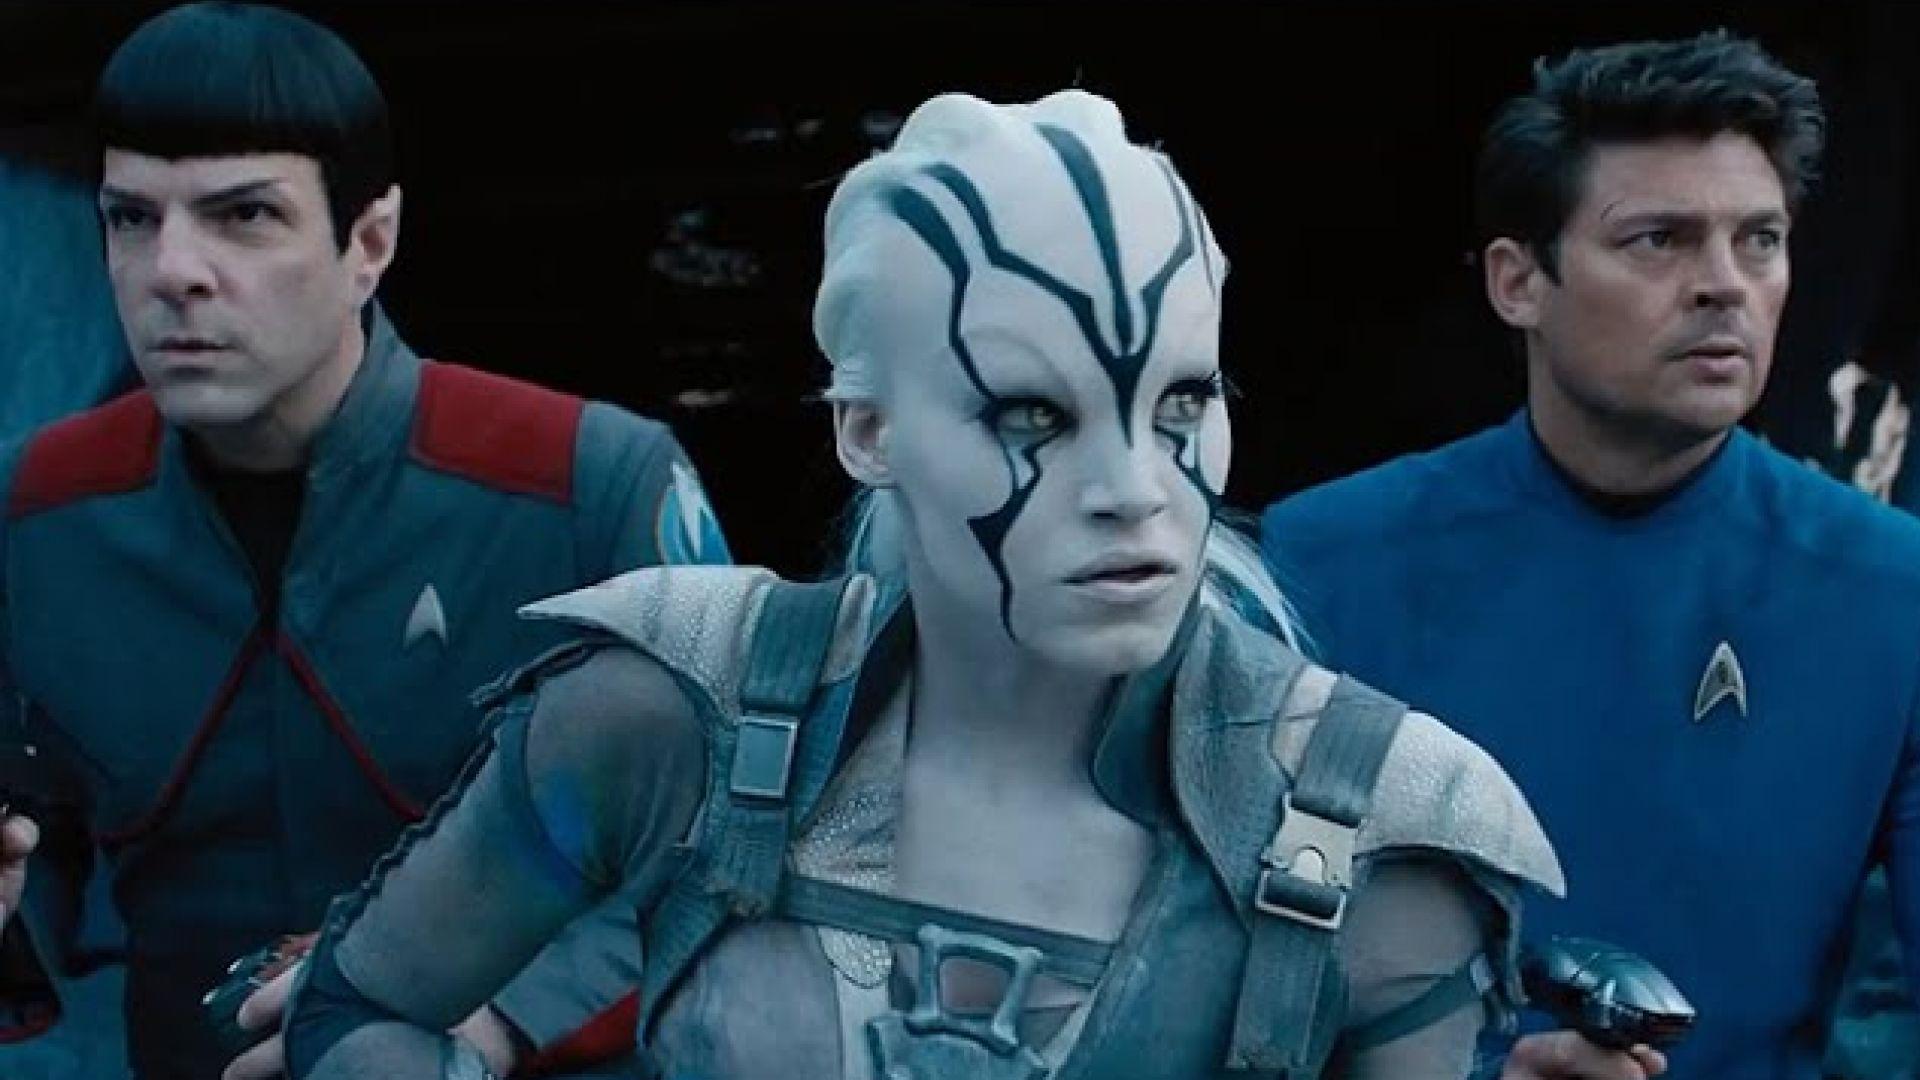 Paramount releases the final trailer for Star Trek Beyond ah